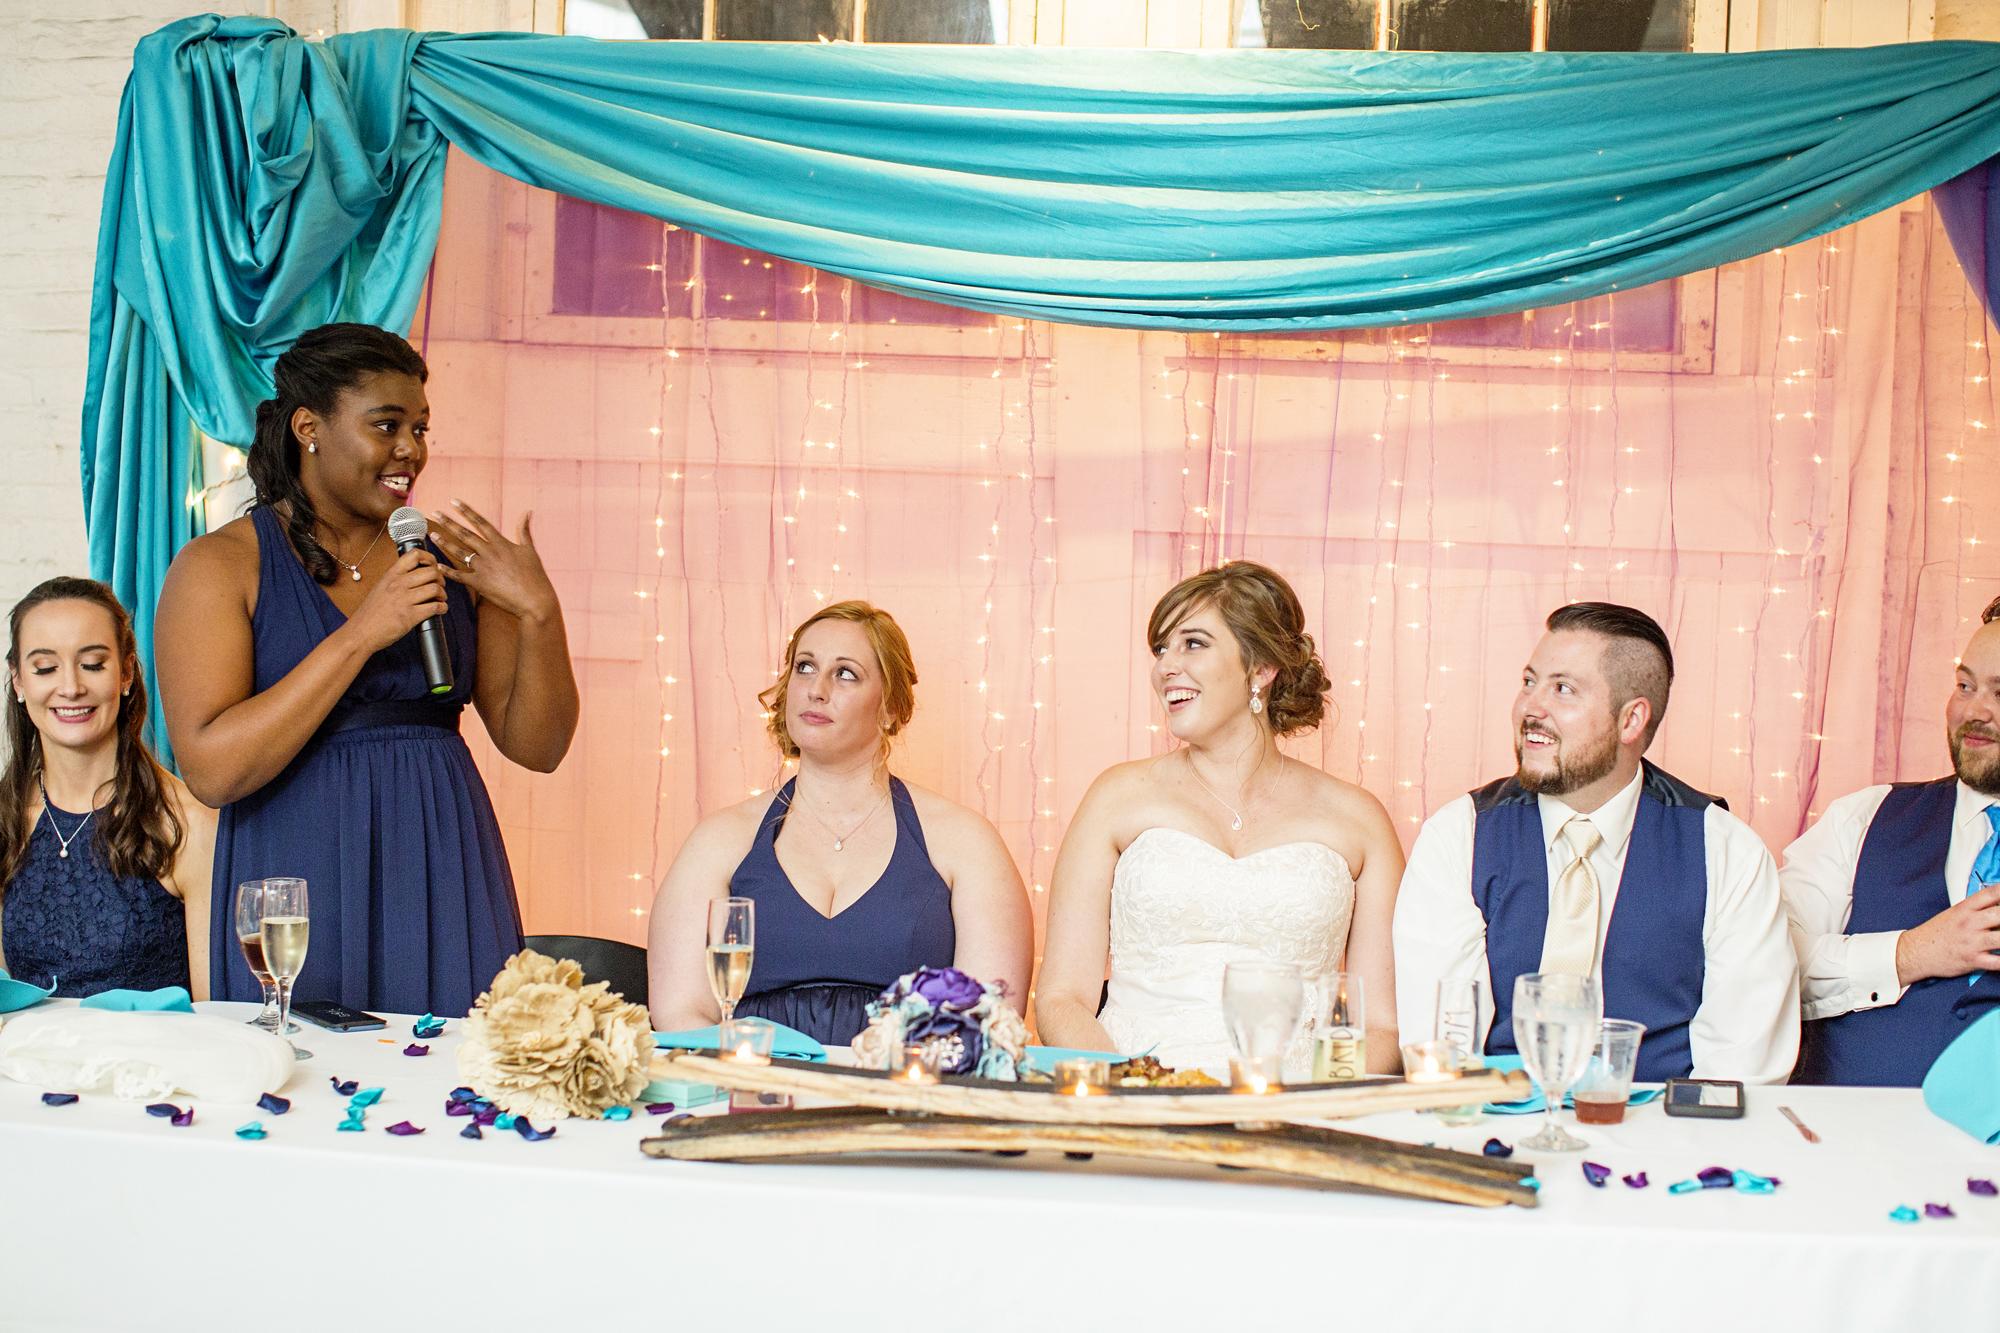 Seriously_Sabrina_Photography_Lexington_Kentucky_21c_Round_Barn_Red_Mile_Wedding_Gorley_104.jpg